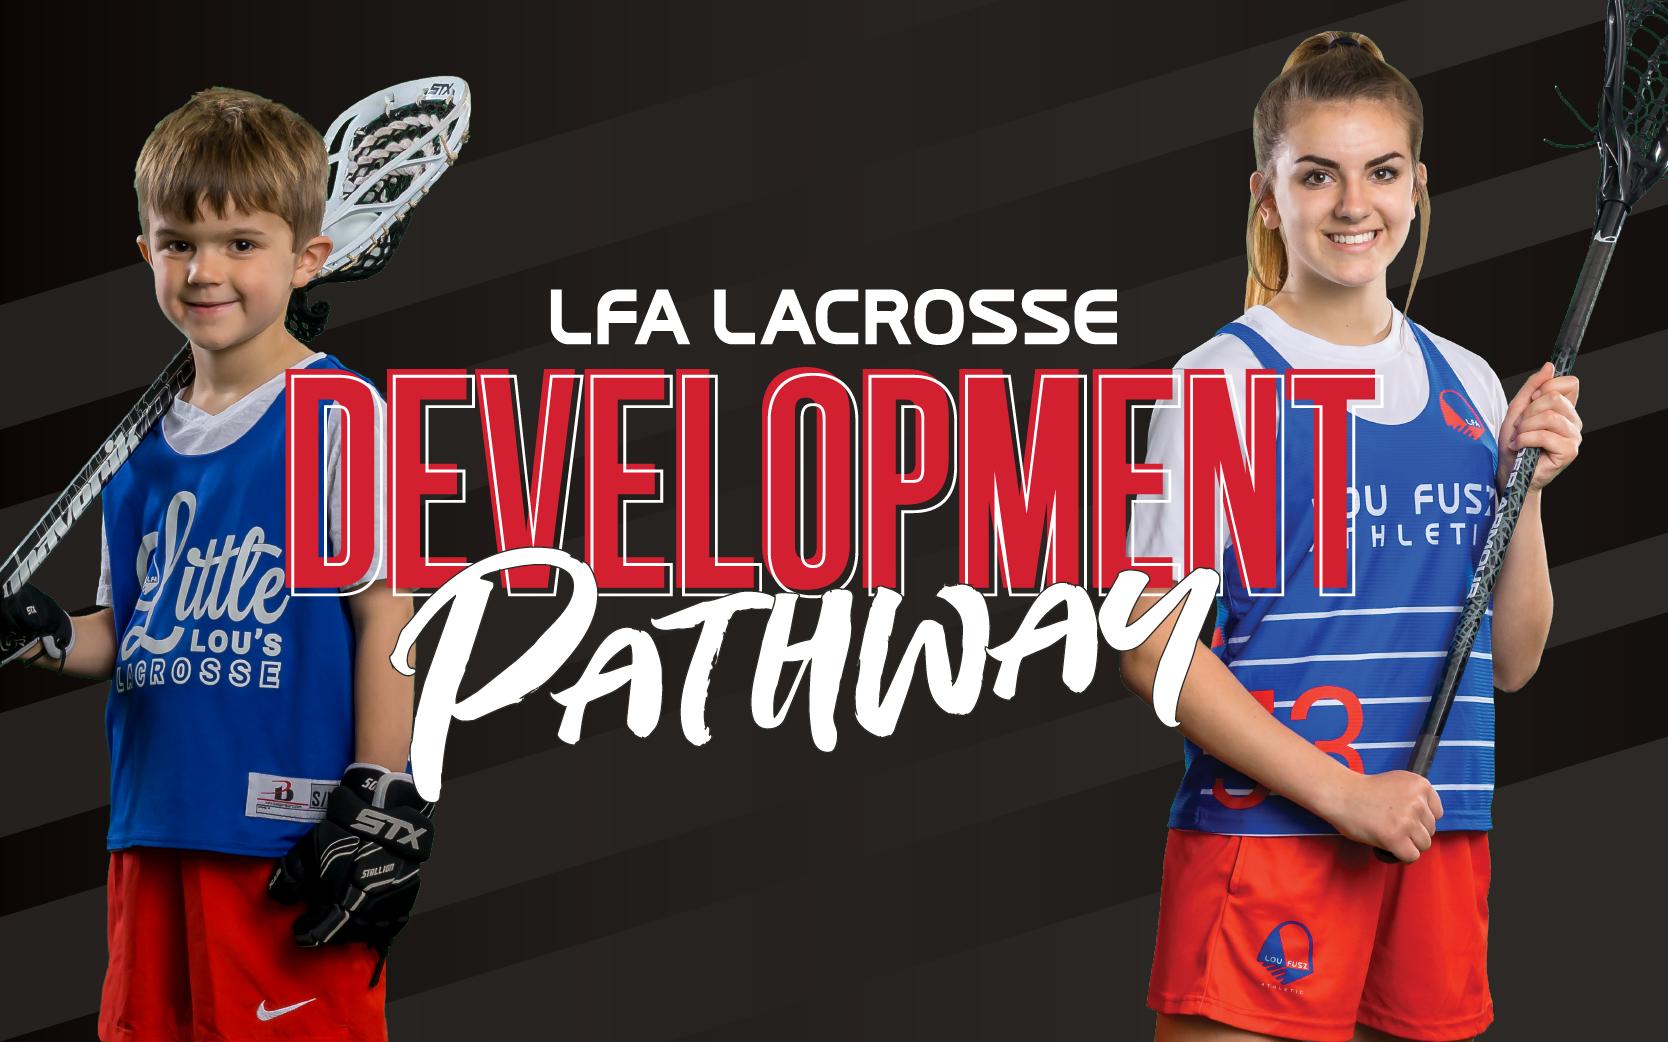 Lacrosse-SmallHeros-DevelopmentPathway